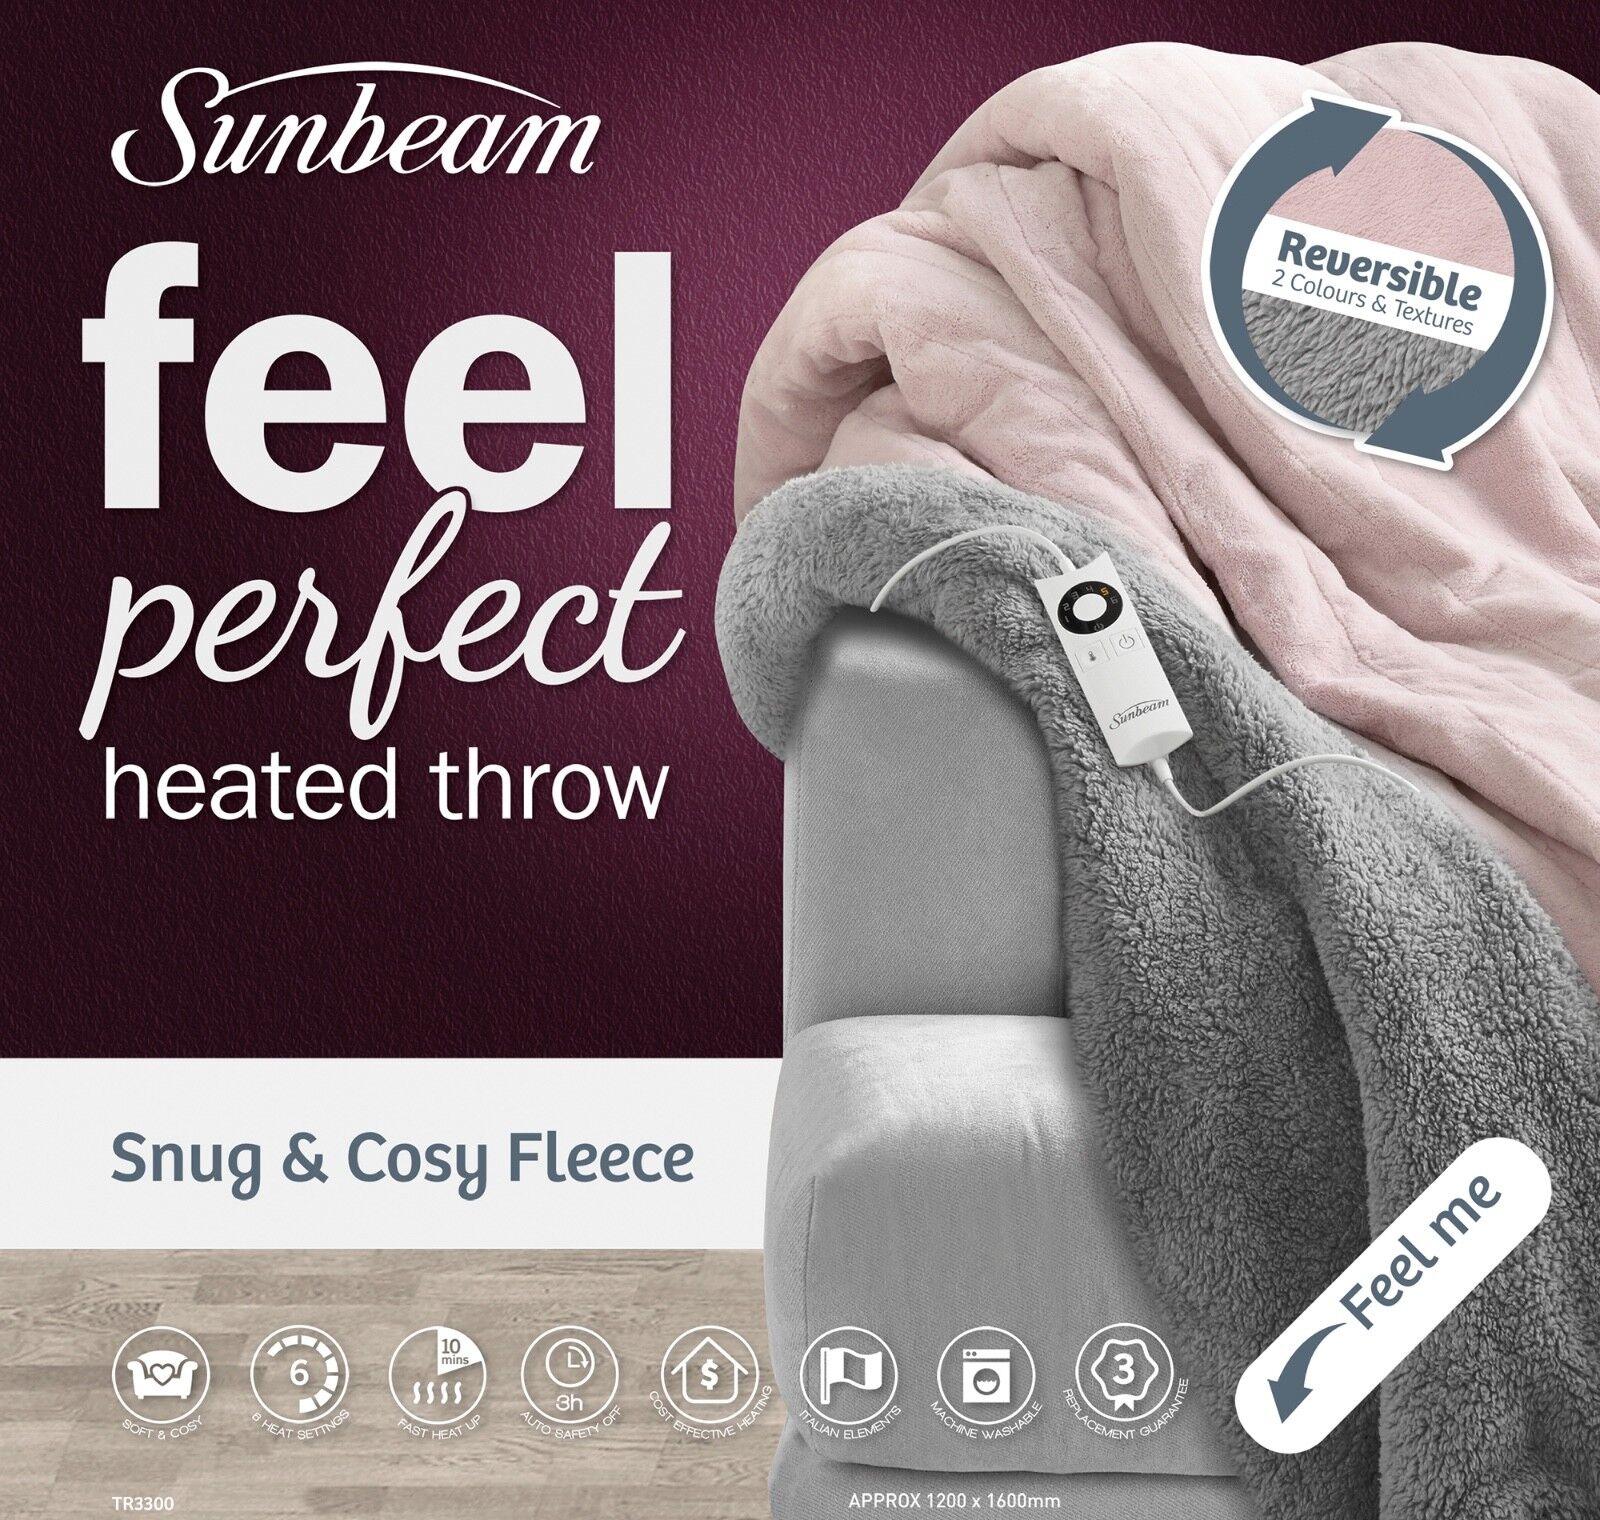 Sunbeam TR3300 Snug & Cosy Reversible Heated Throw - Pink & Grey